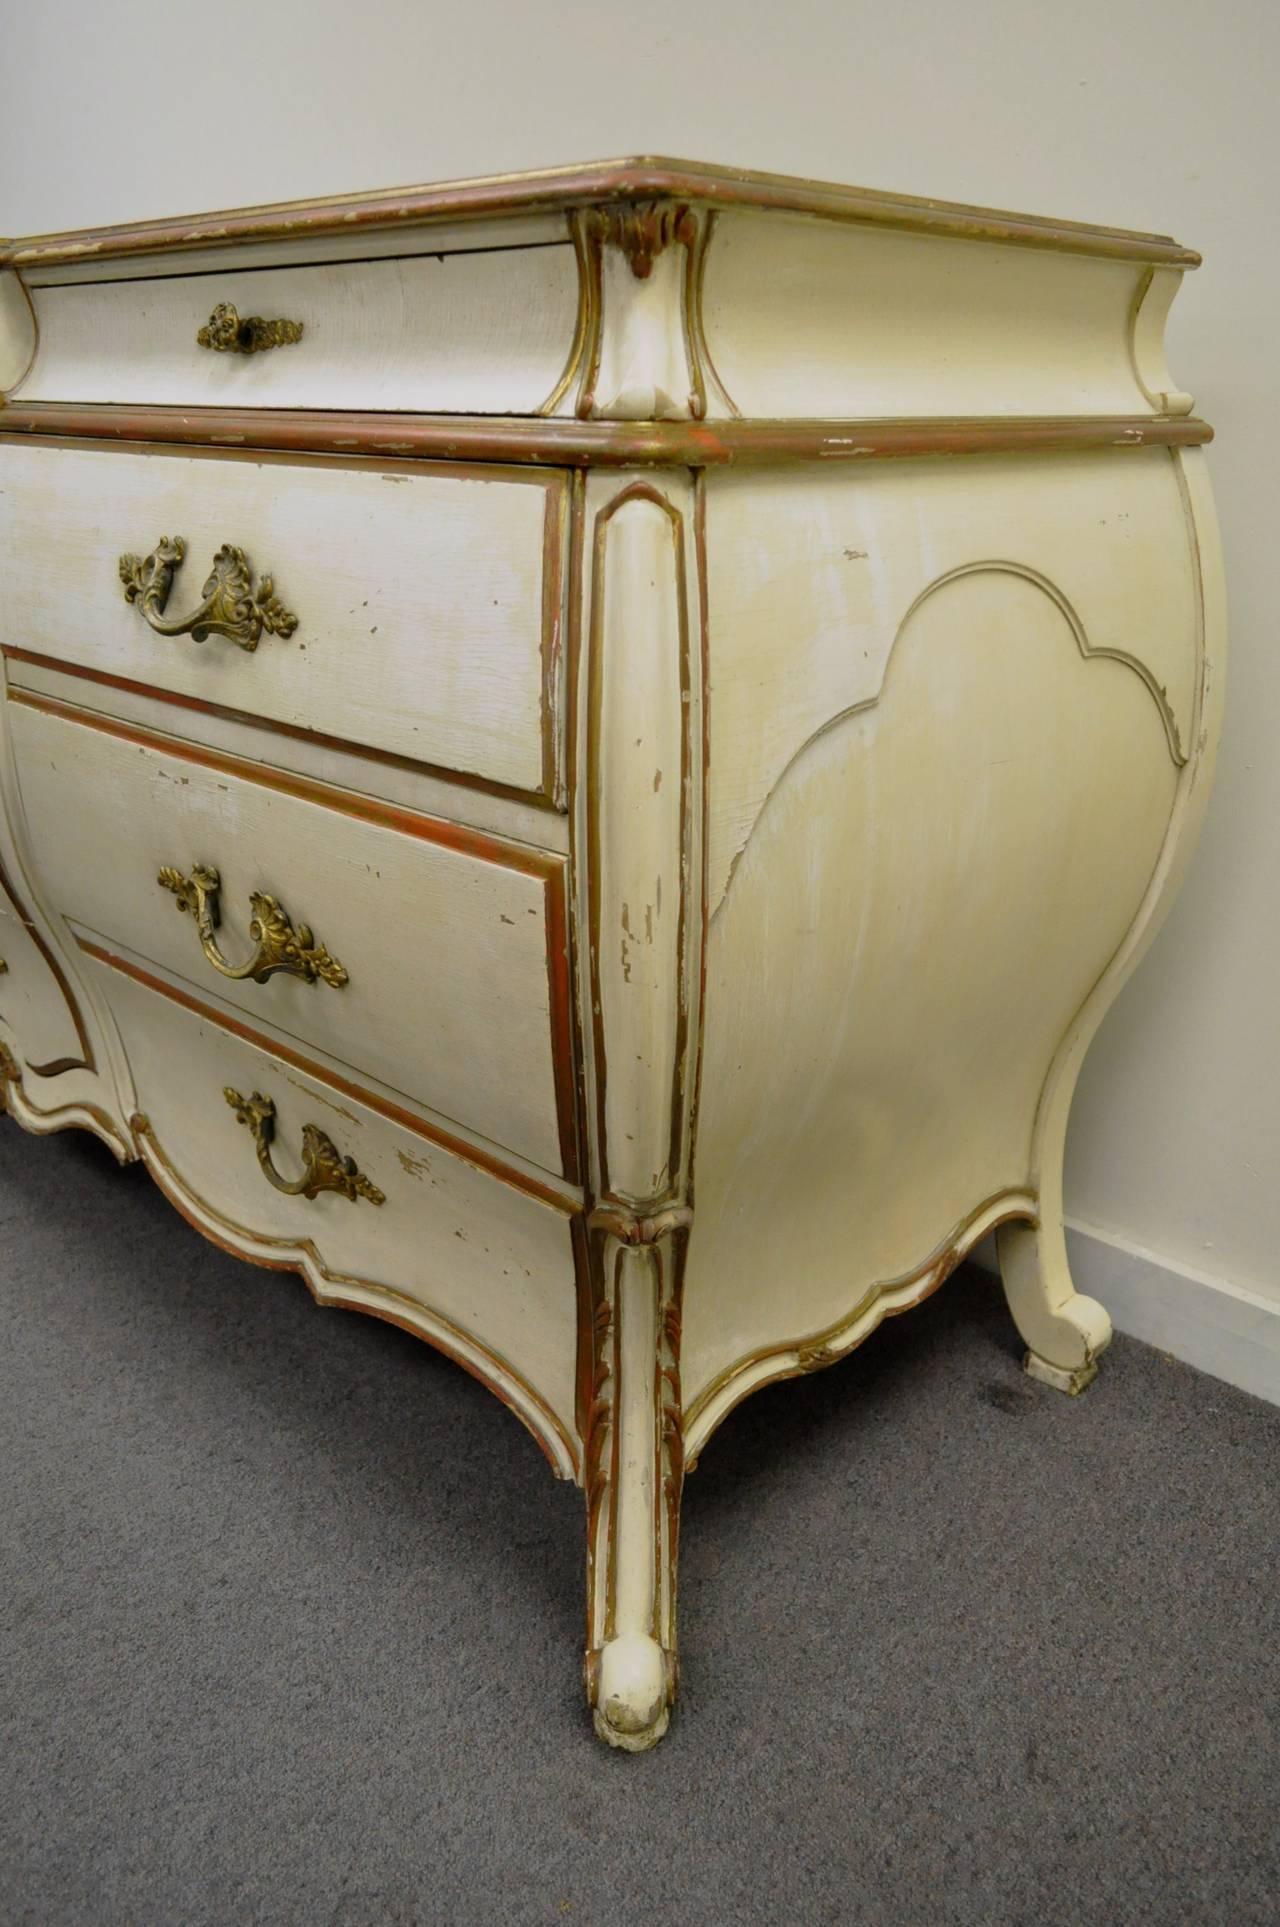 20th Century Custom Italian Hollywood Regency Gold Leaf Bombe Dresser or Commode For Sale